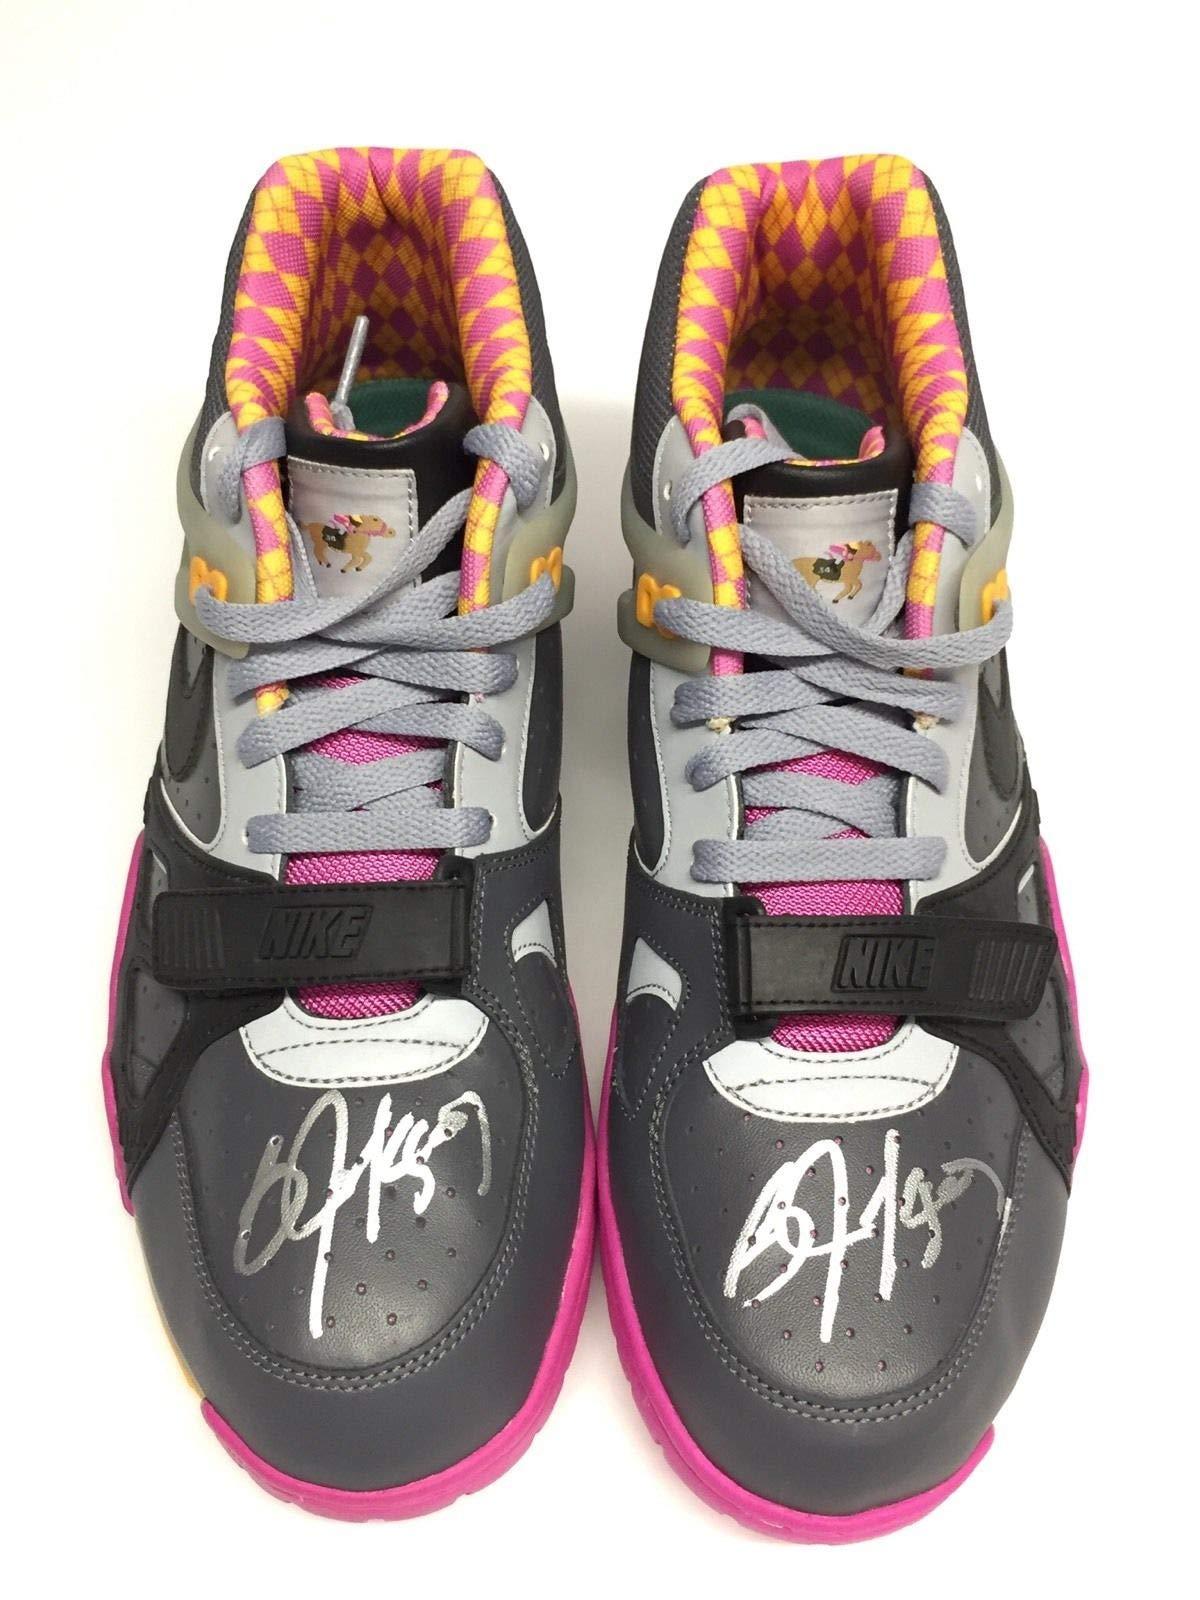 Bo Jackson Dual Autographed Signed Nike Air Trainer Iii Prm Qs Raiders Royals Shoes JSA Authentic Memorabilia